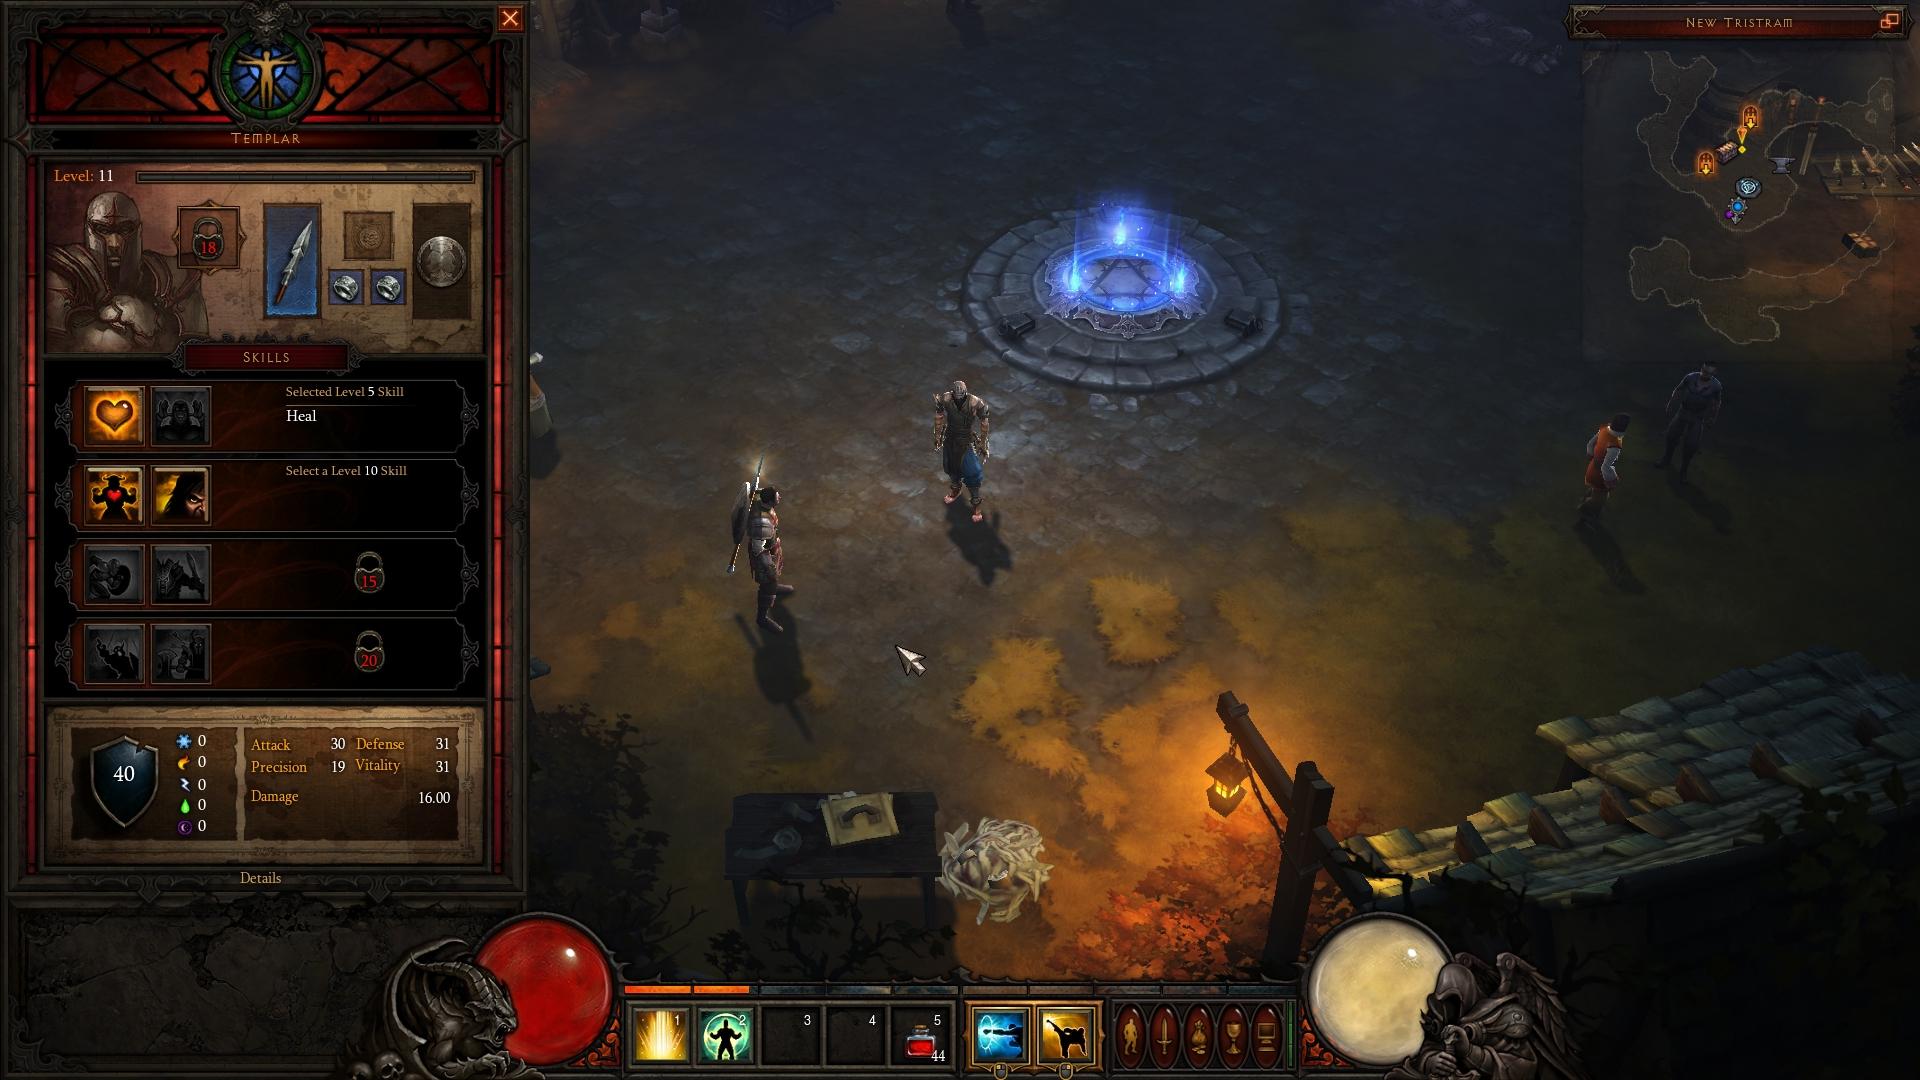 Diablo 3 Begleiter